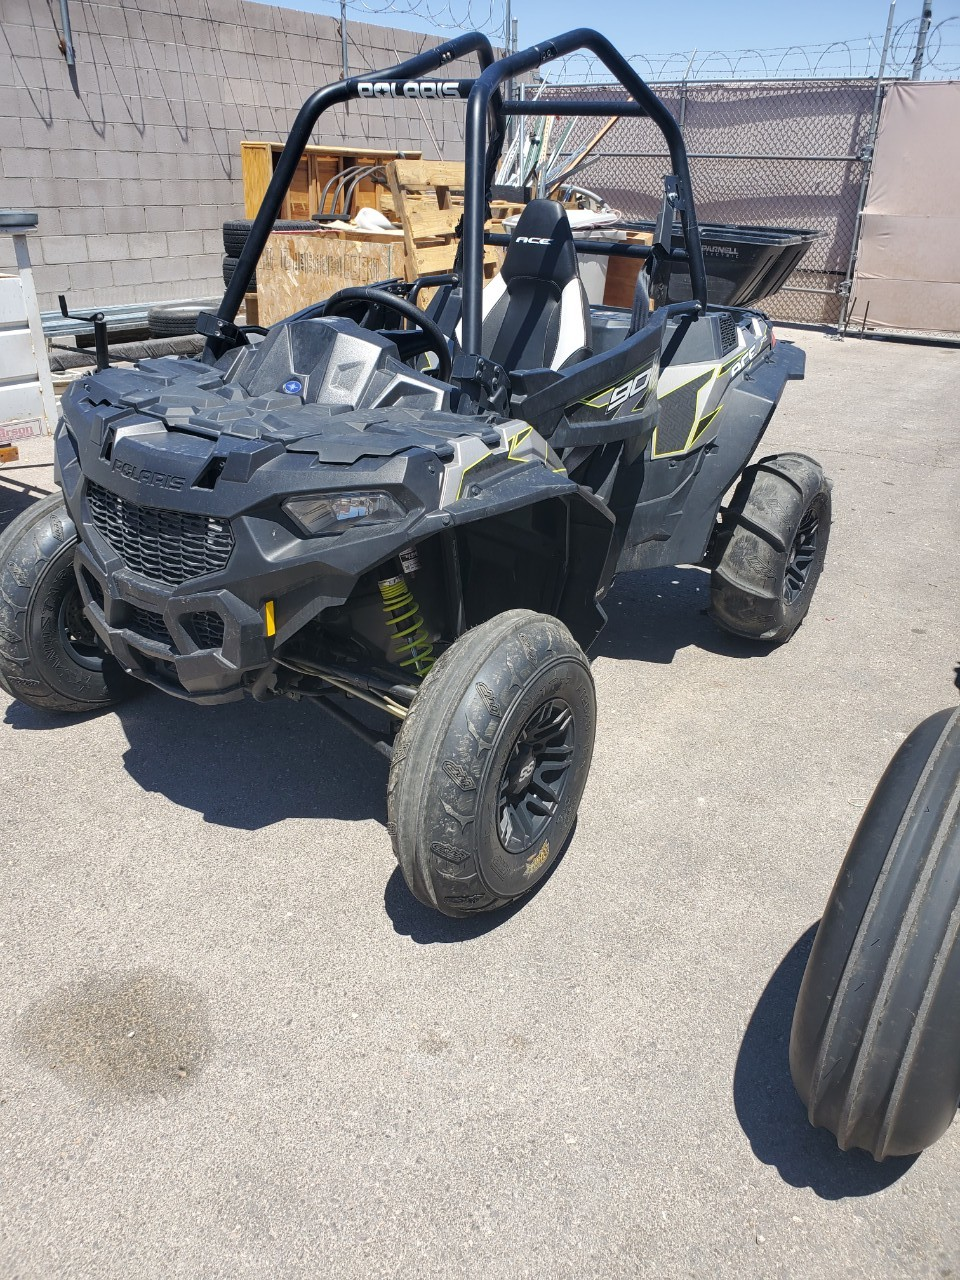 Ace 900 Xc For Sale - Polaris Three Wheeler ATVs - ATV Trader